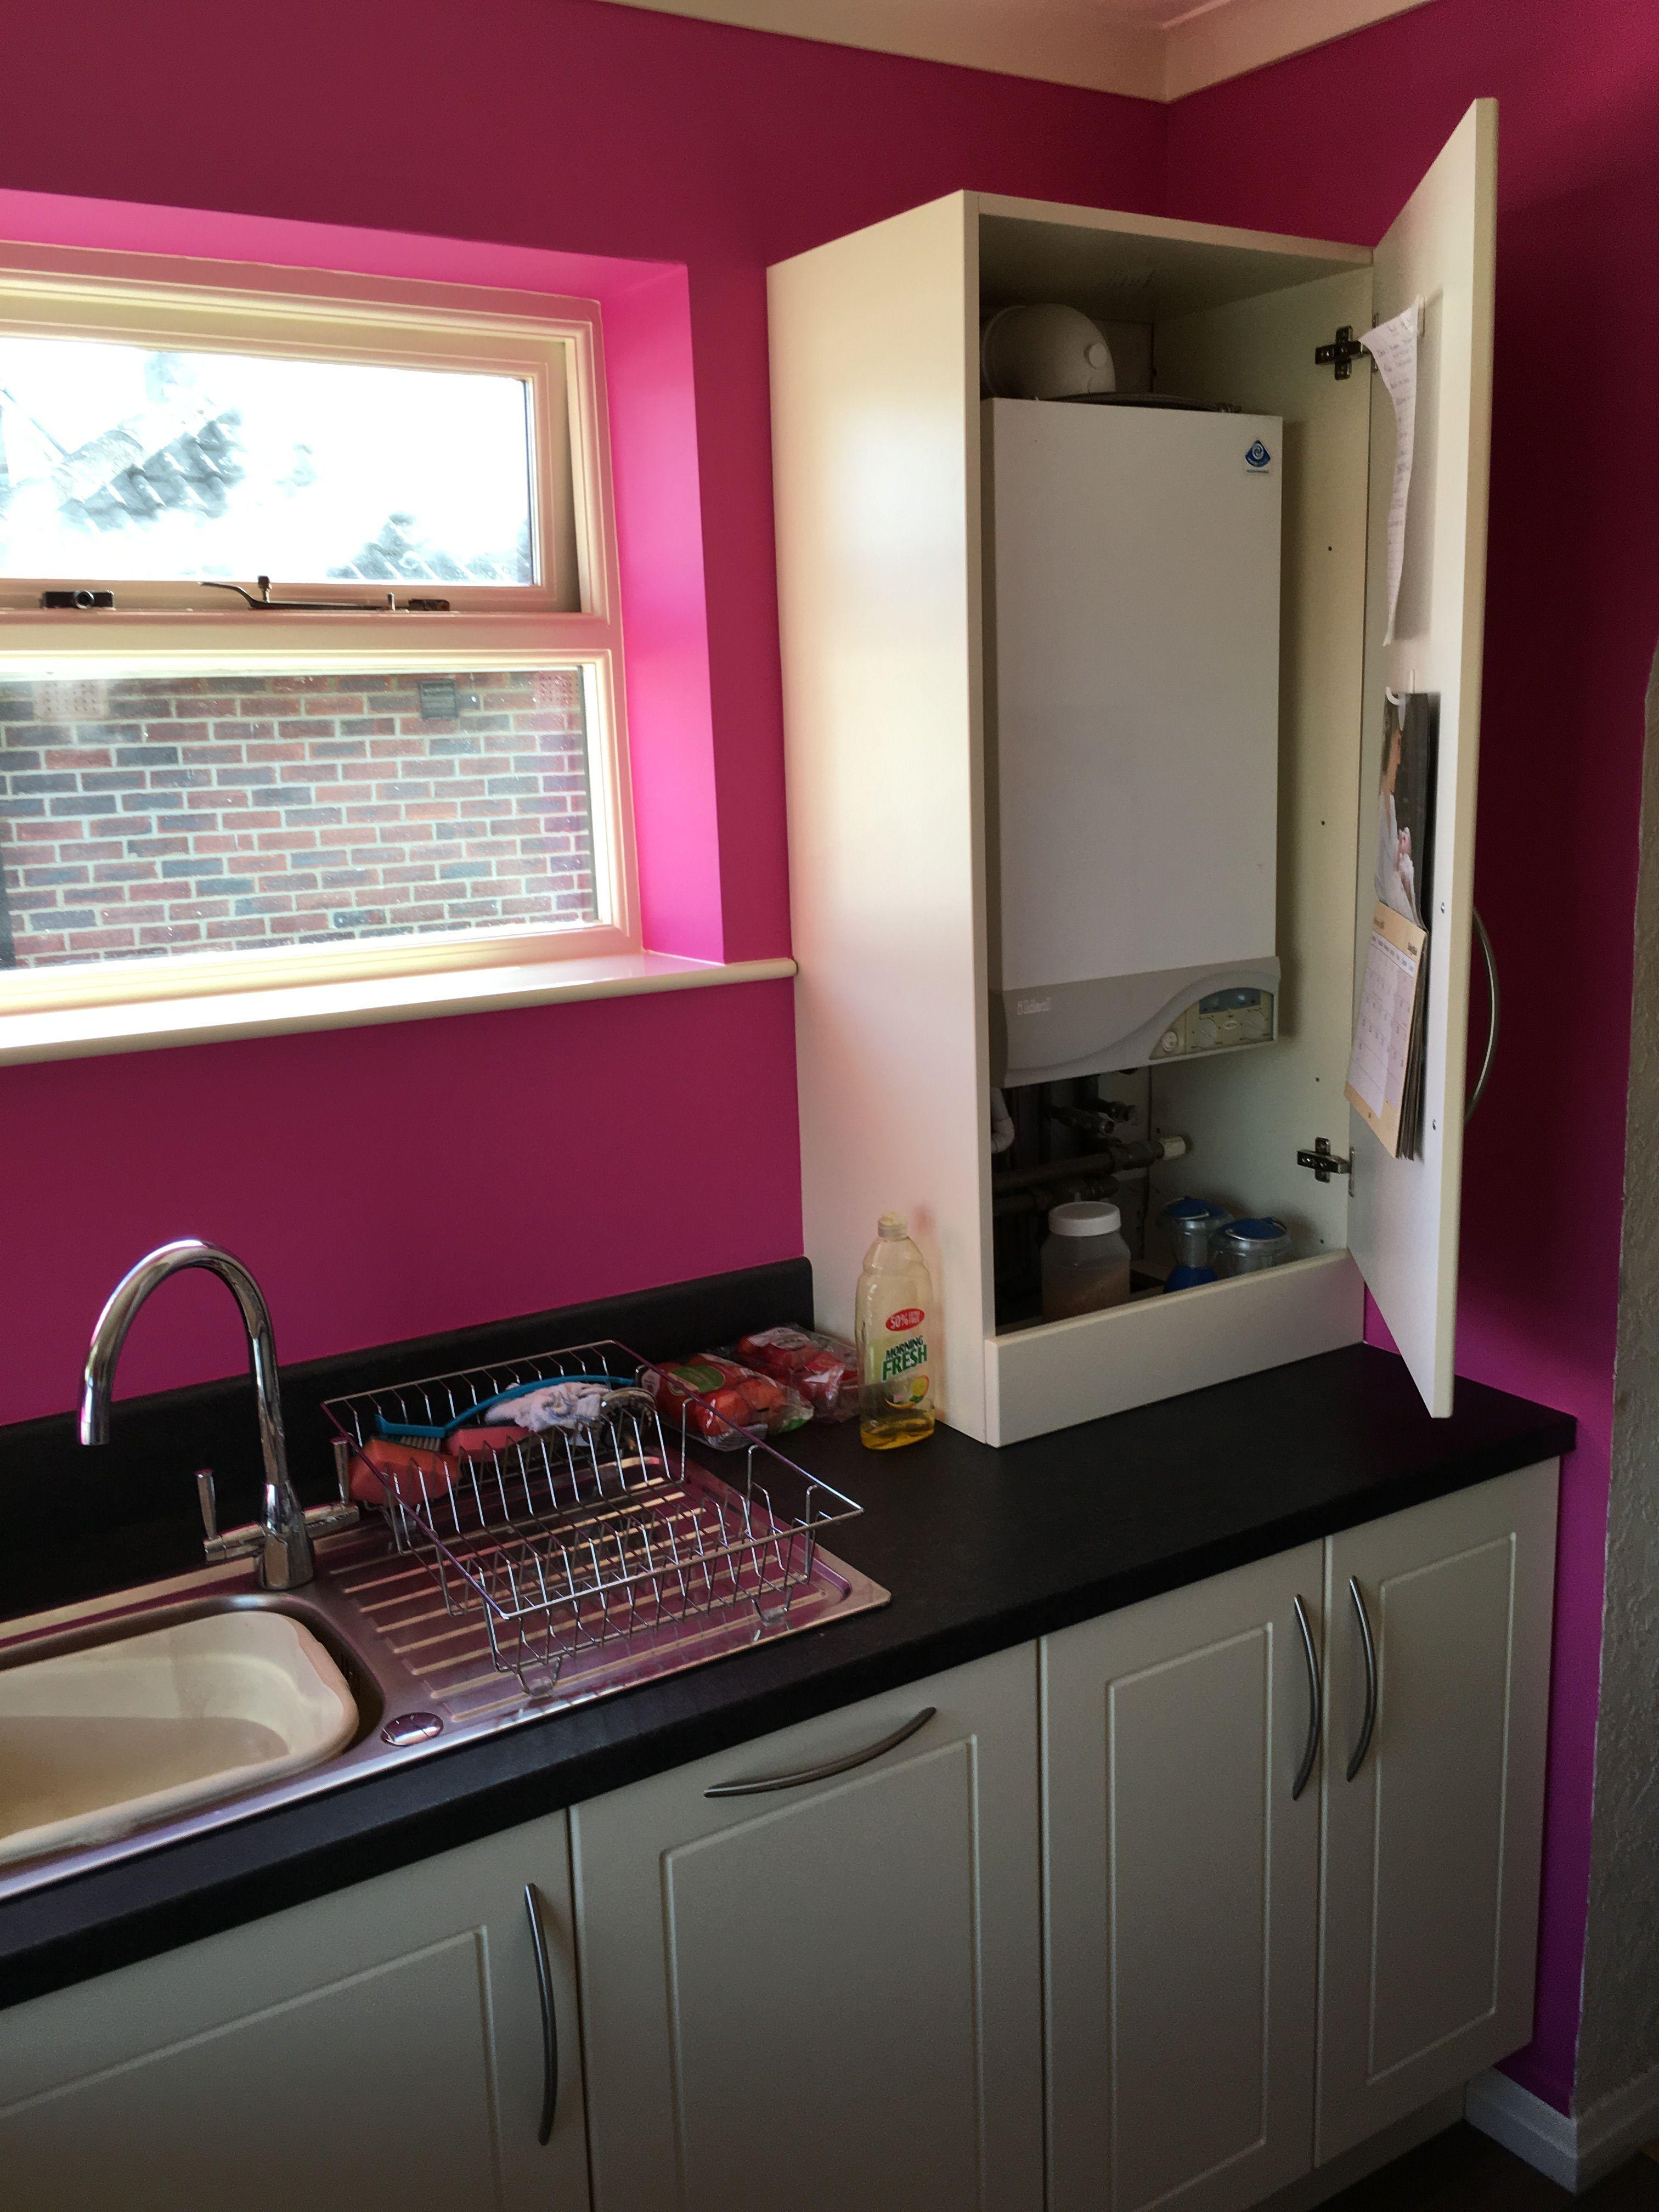 Boiler Housing In 2020 Hidden Kitchen Boiler Cover Ideas Kitchen Cupboards